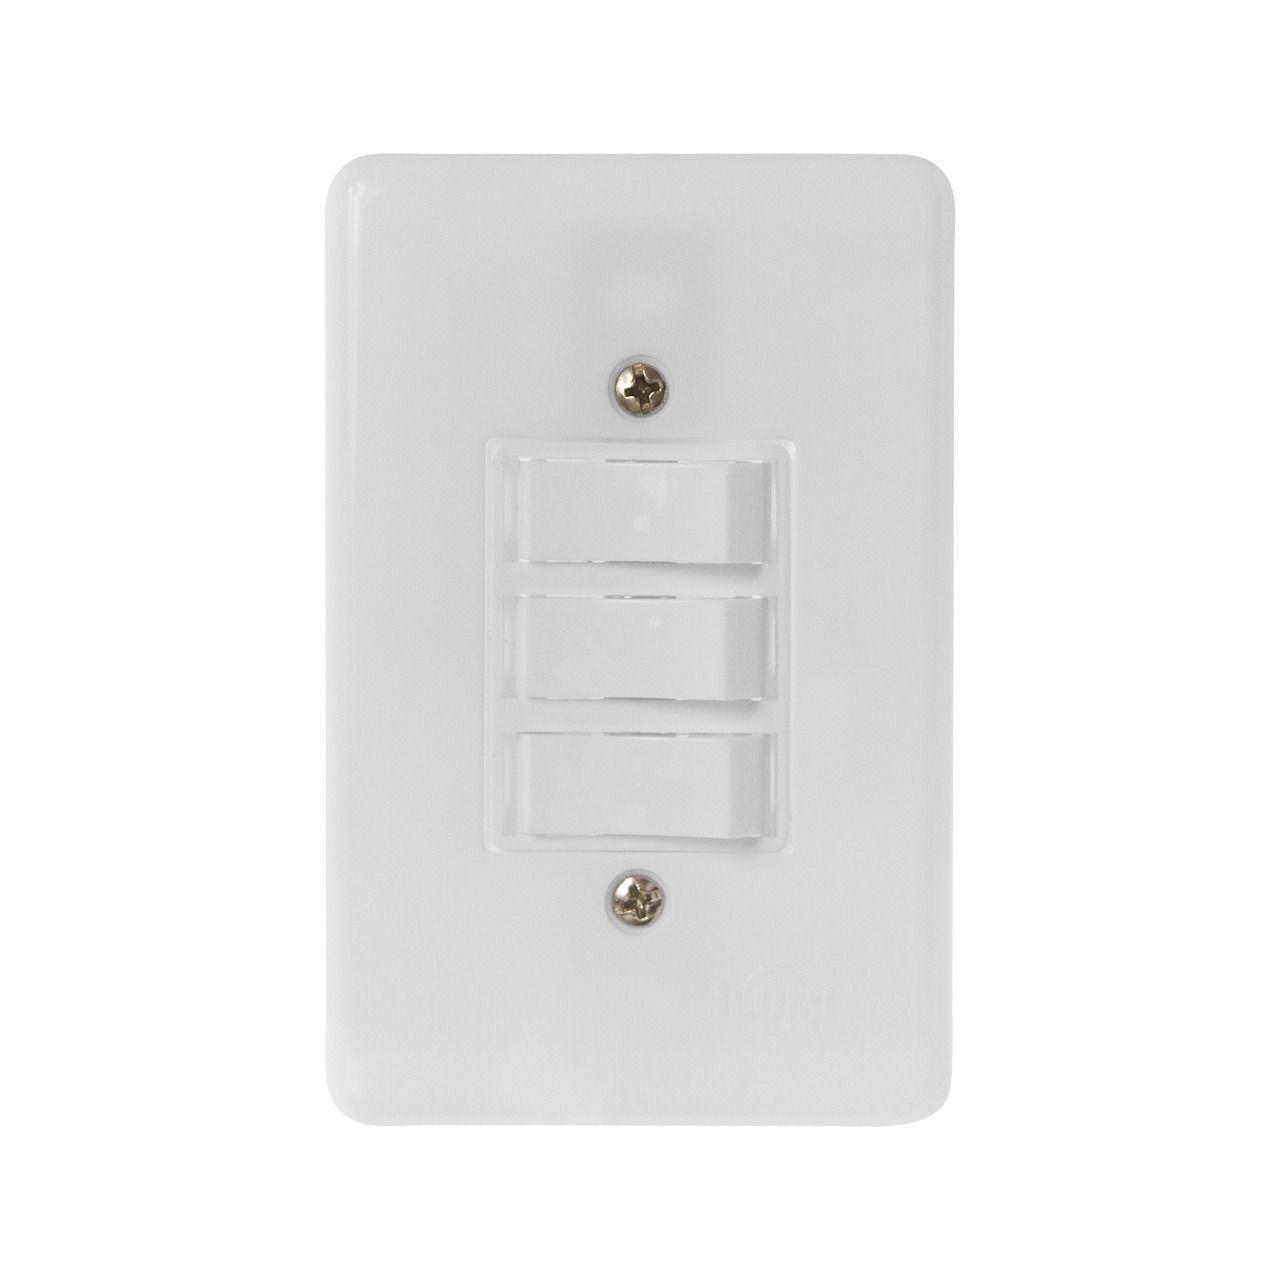 Conjunto Stylus 1 Interruptor simples +2 Interruptor Paralelo 2026 Ilumi